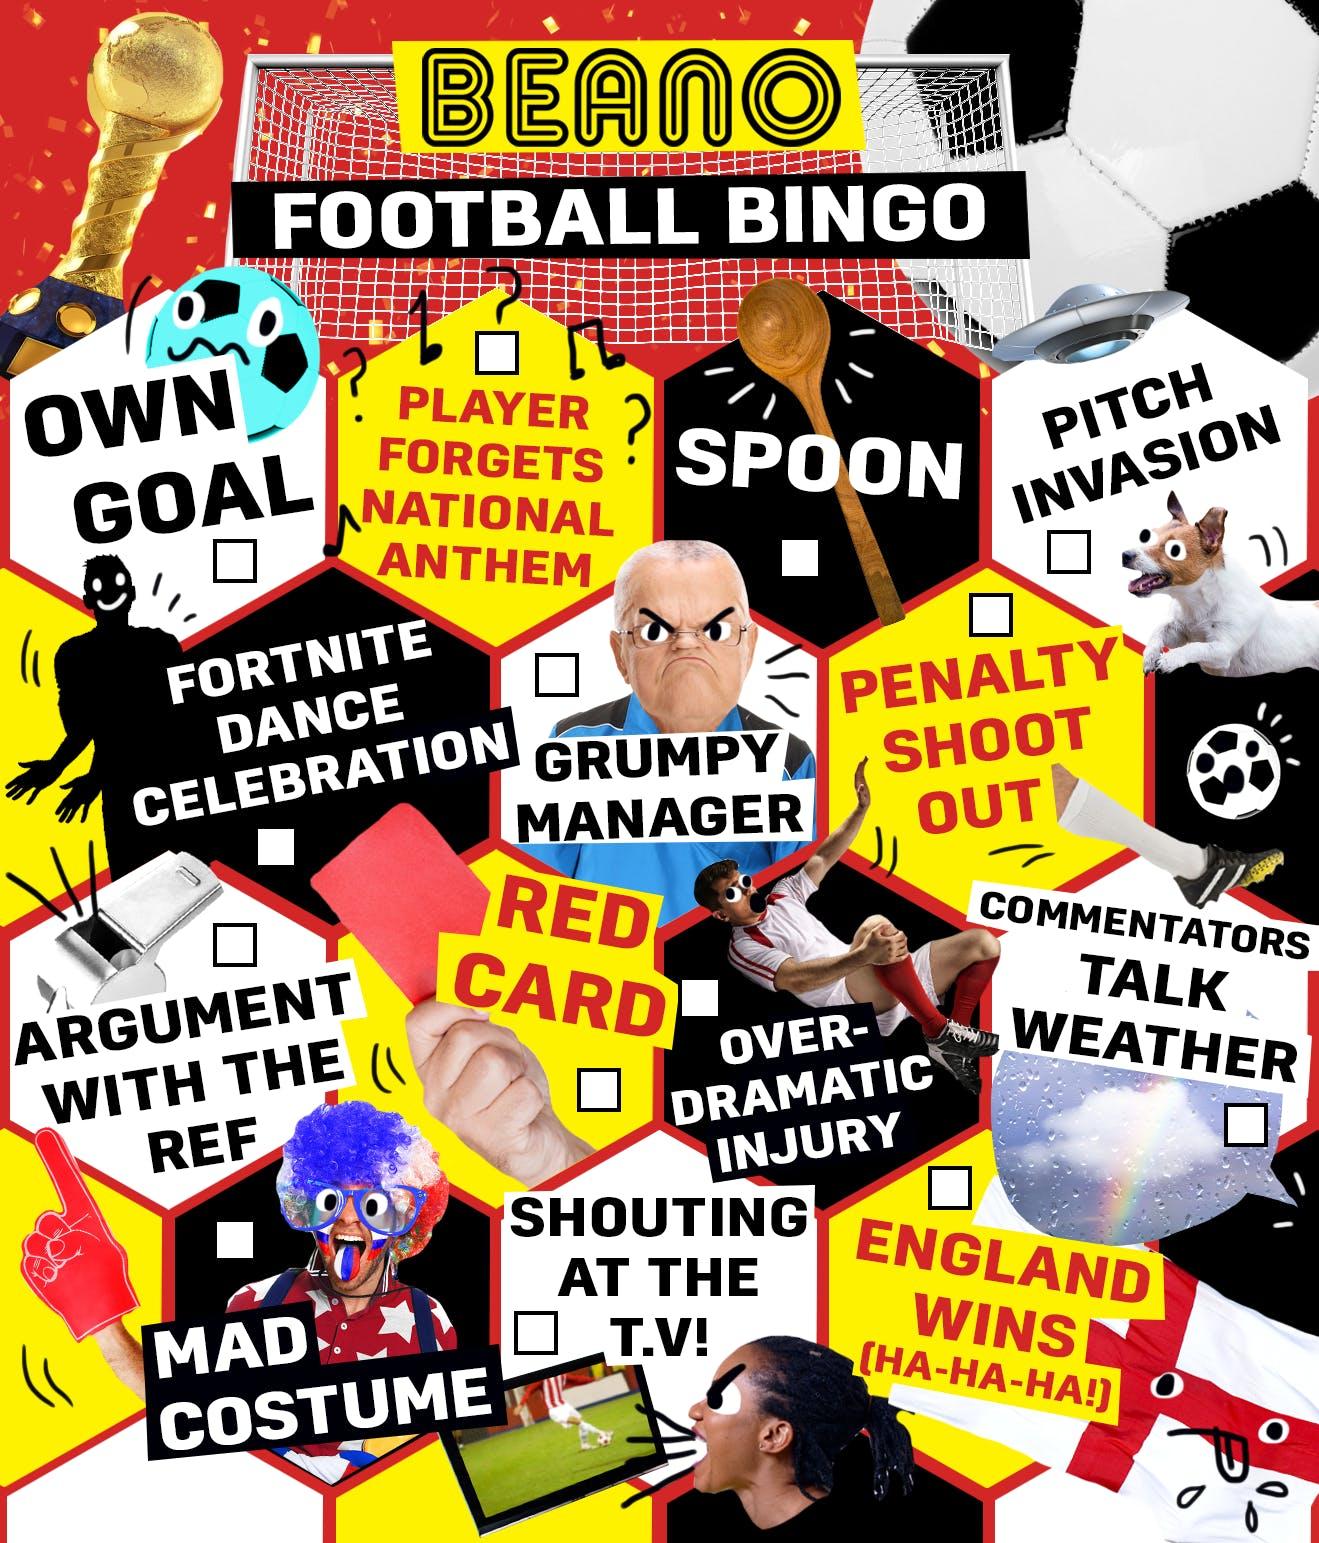 Beano Football Bingo Card